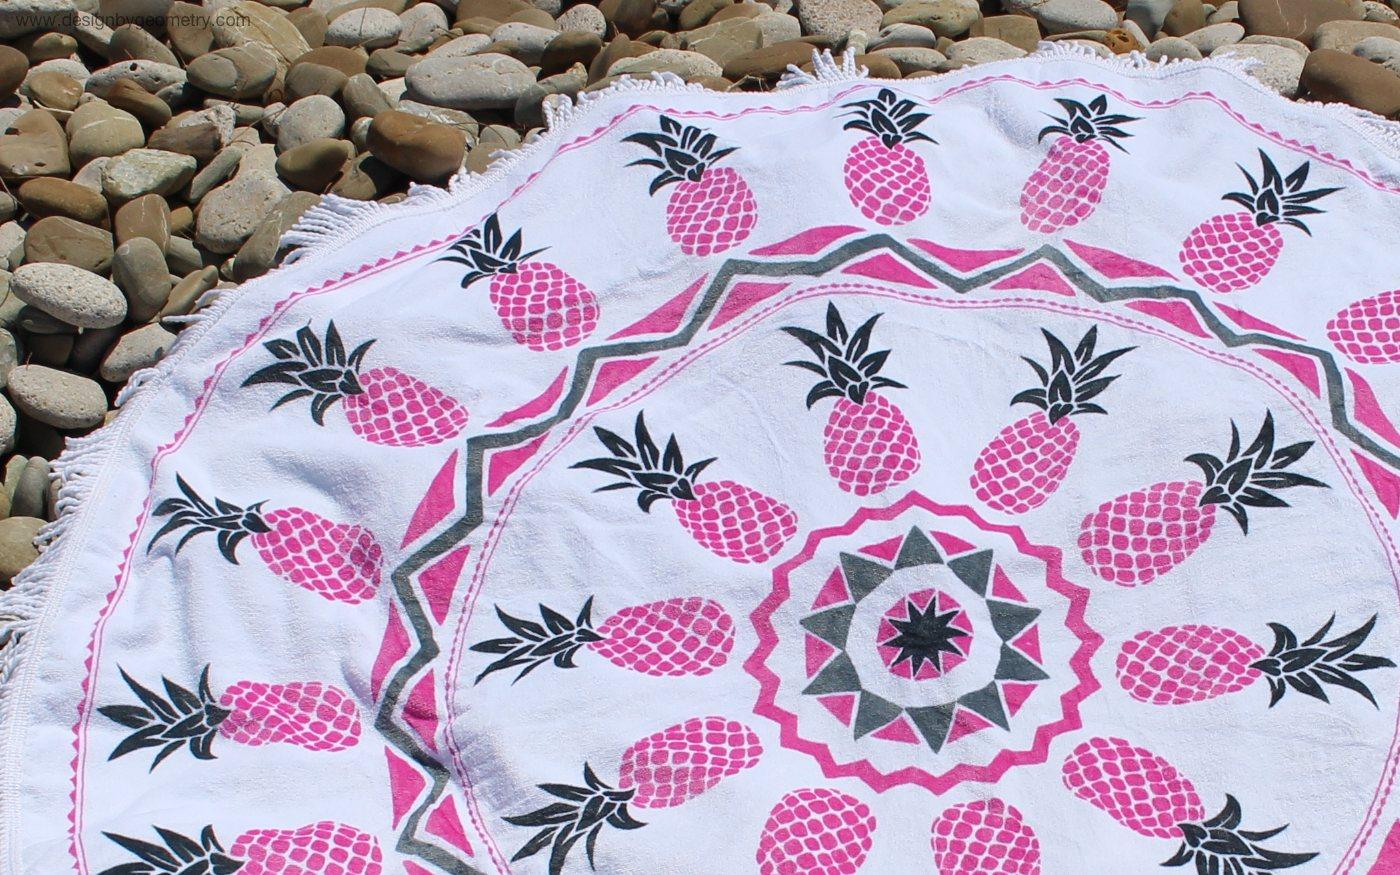 Round towel designed by Chris Heath